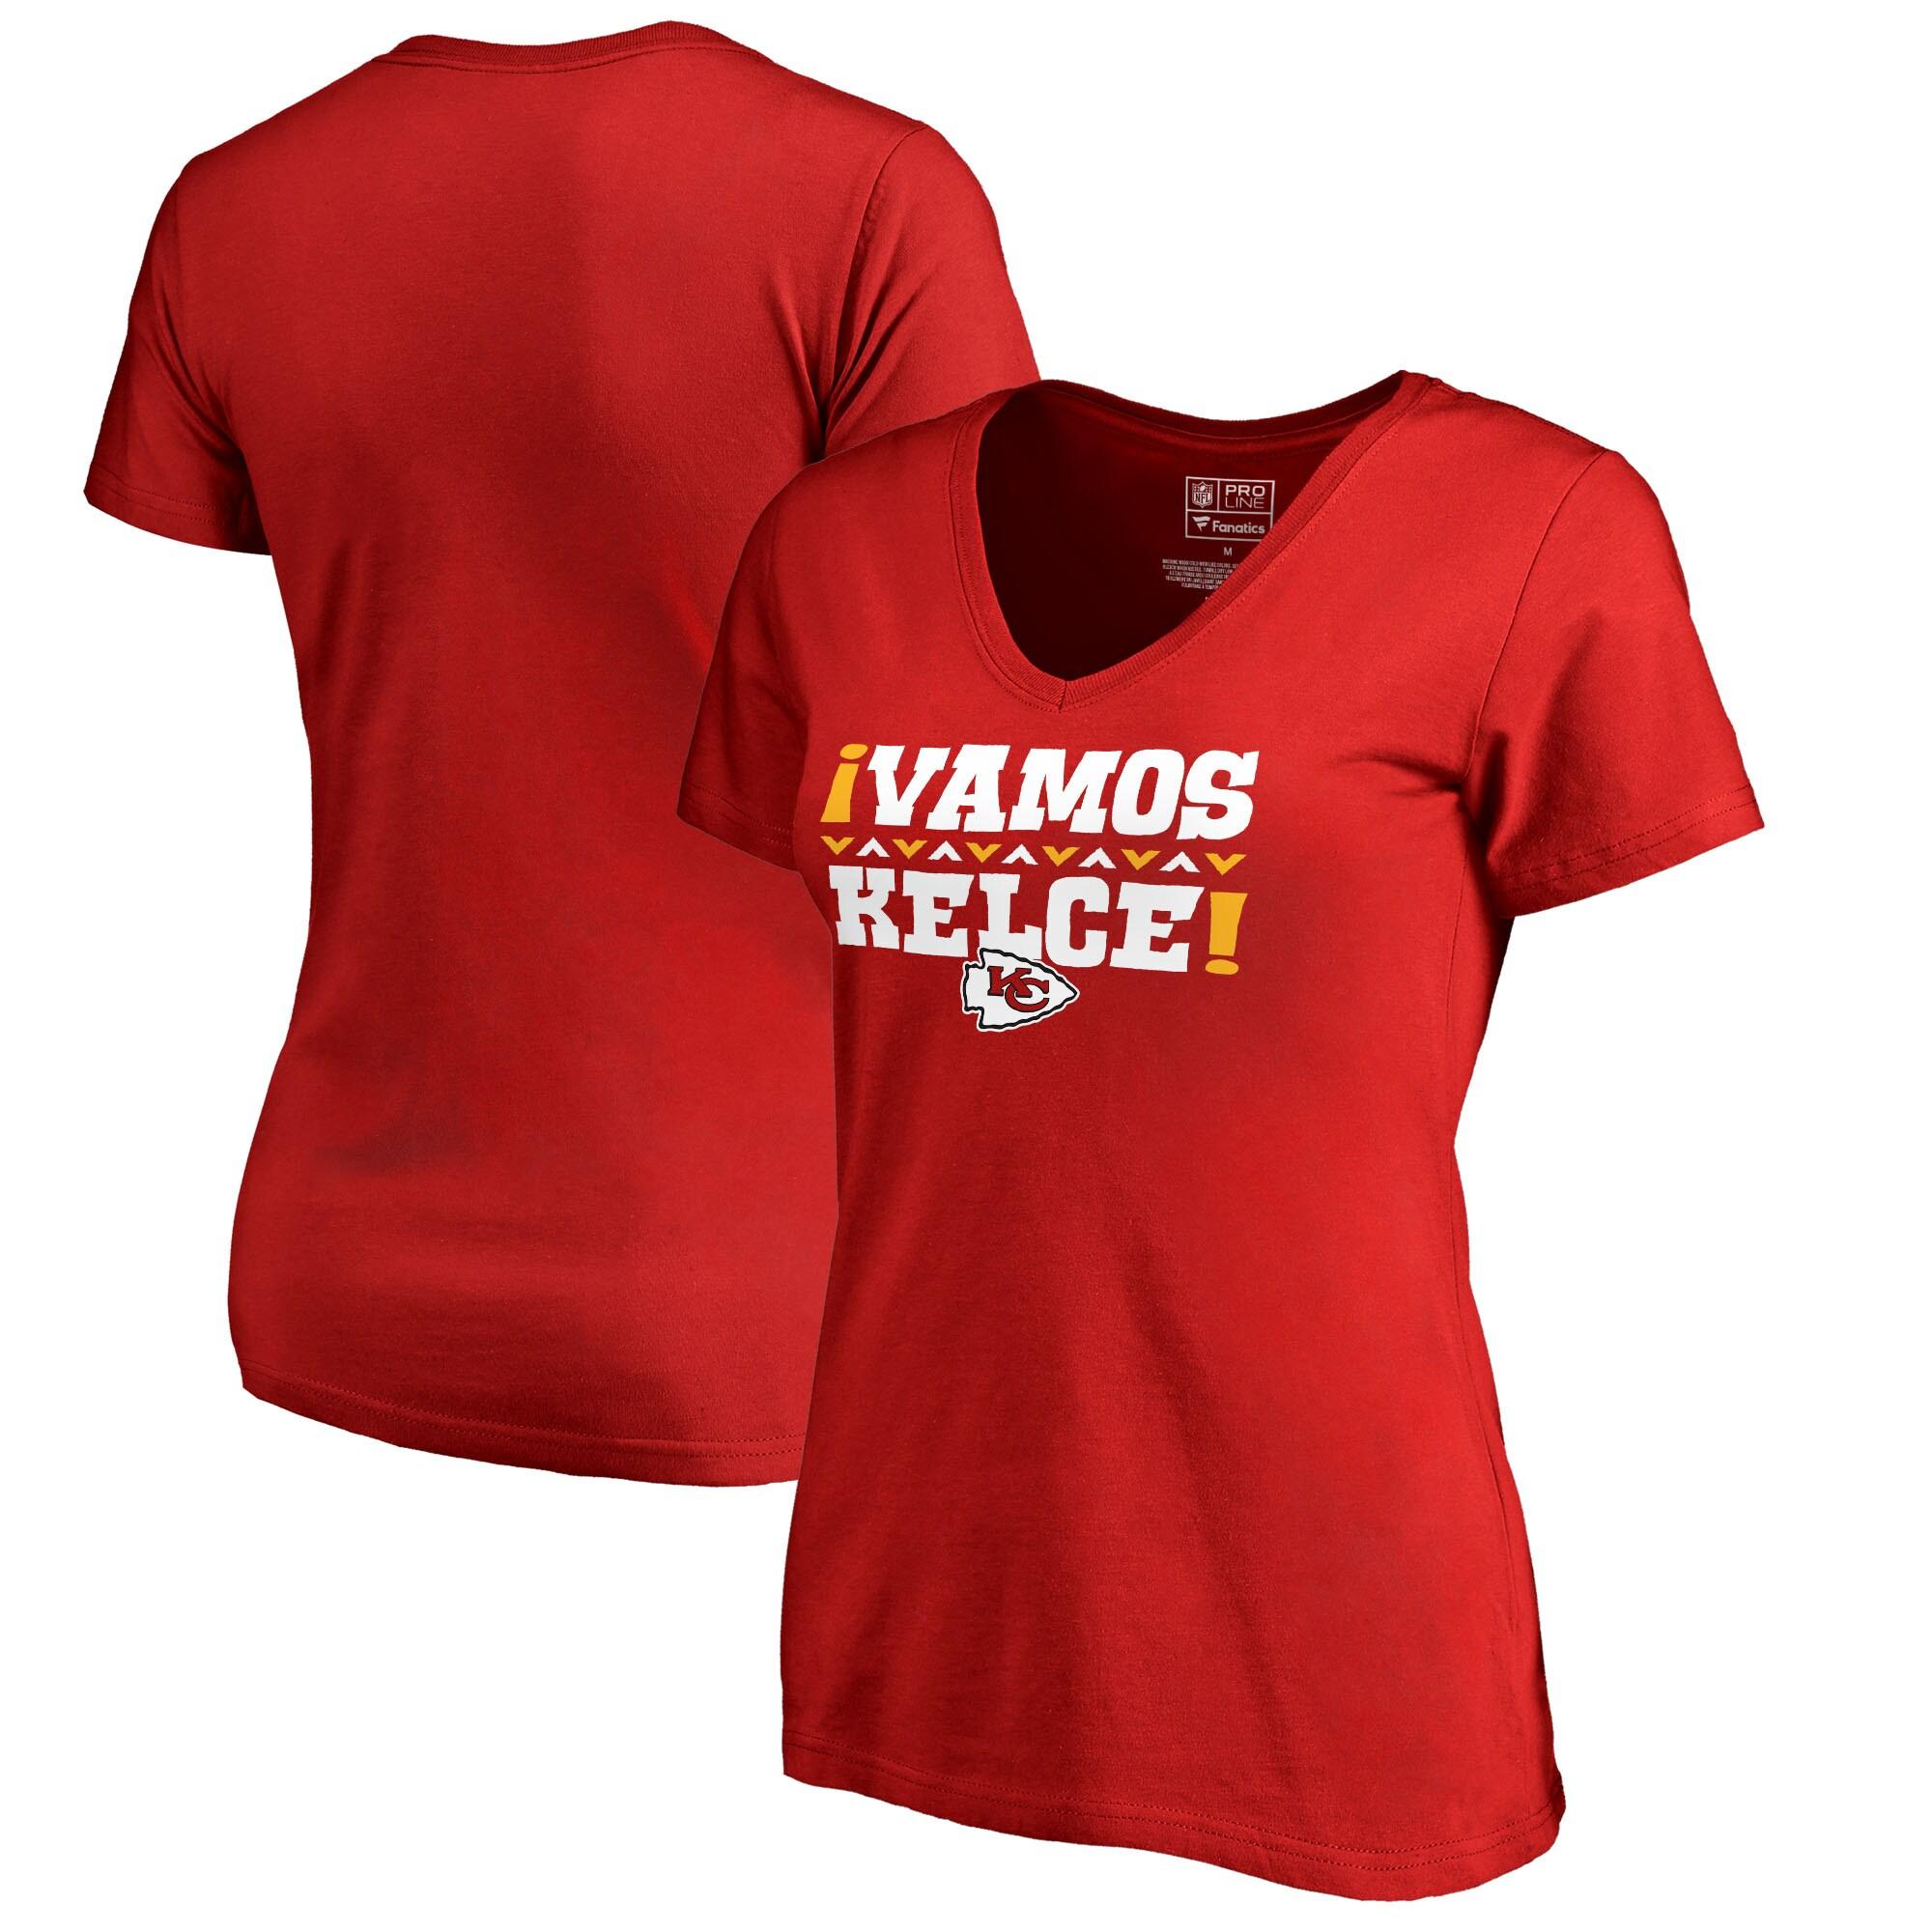 Travis Kelce Kansas City Chiefs NFL Pro Line by Fanatics Branded Women's Vamos V-Neck T-Shirt - Red